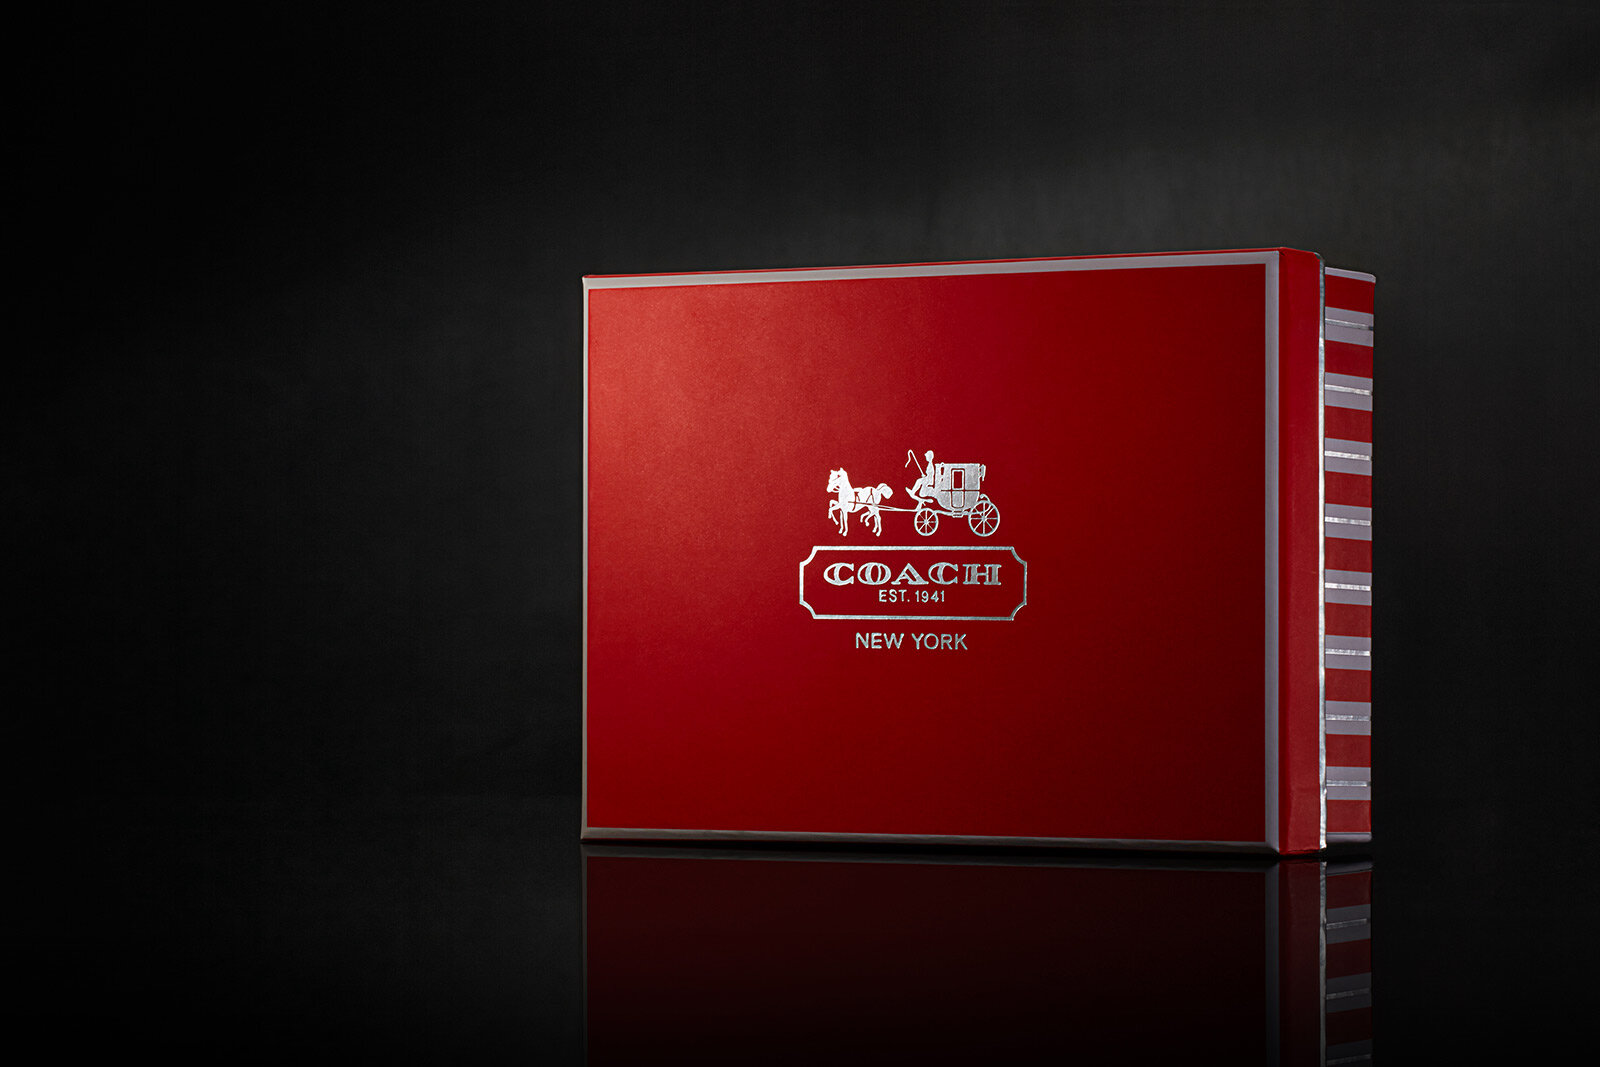 Coach-Box-Holiday-Design-Packaging-Company-2.JPG